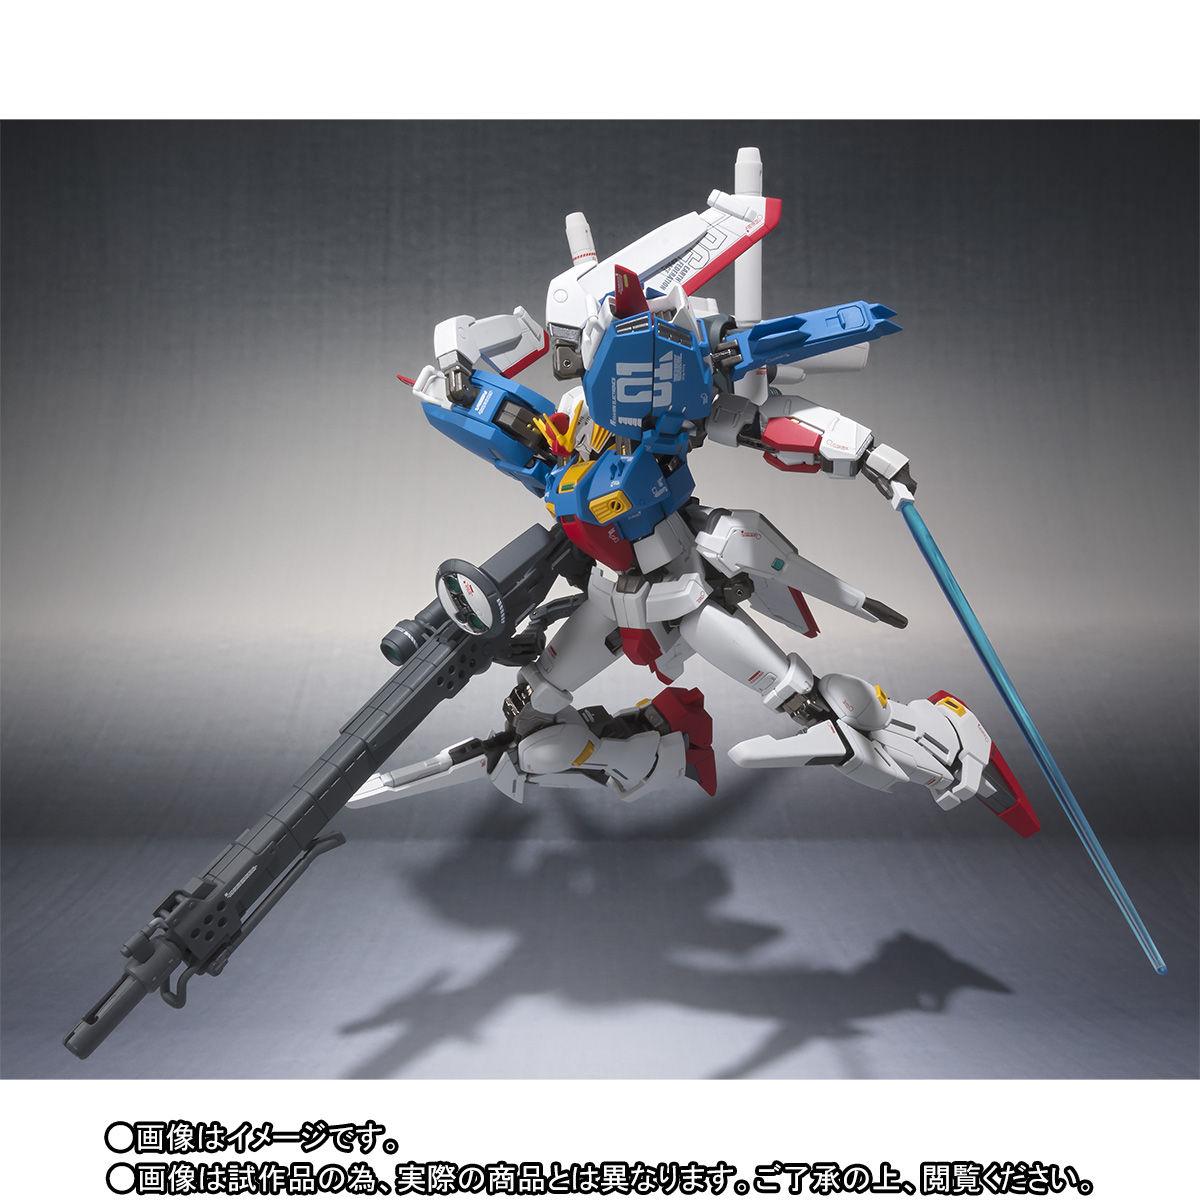 METAL ROBOT魂(Ka signature)〈SIDE MS〉『Sガンダム』可動フィギュア-003